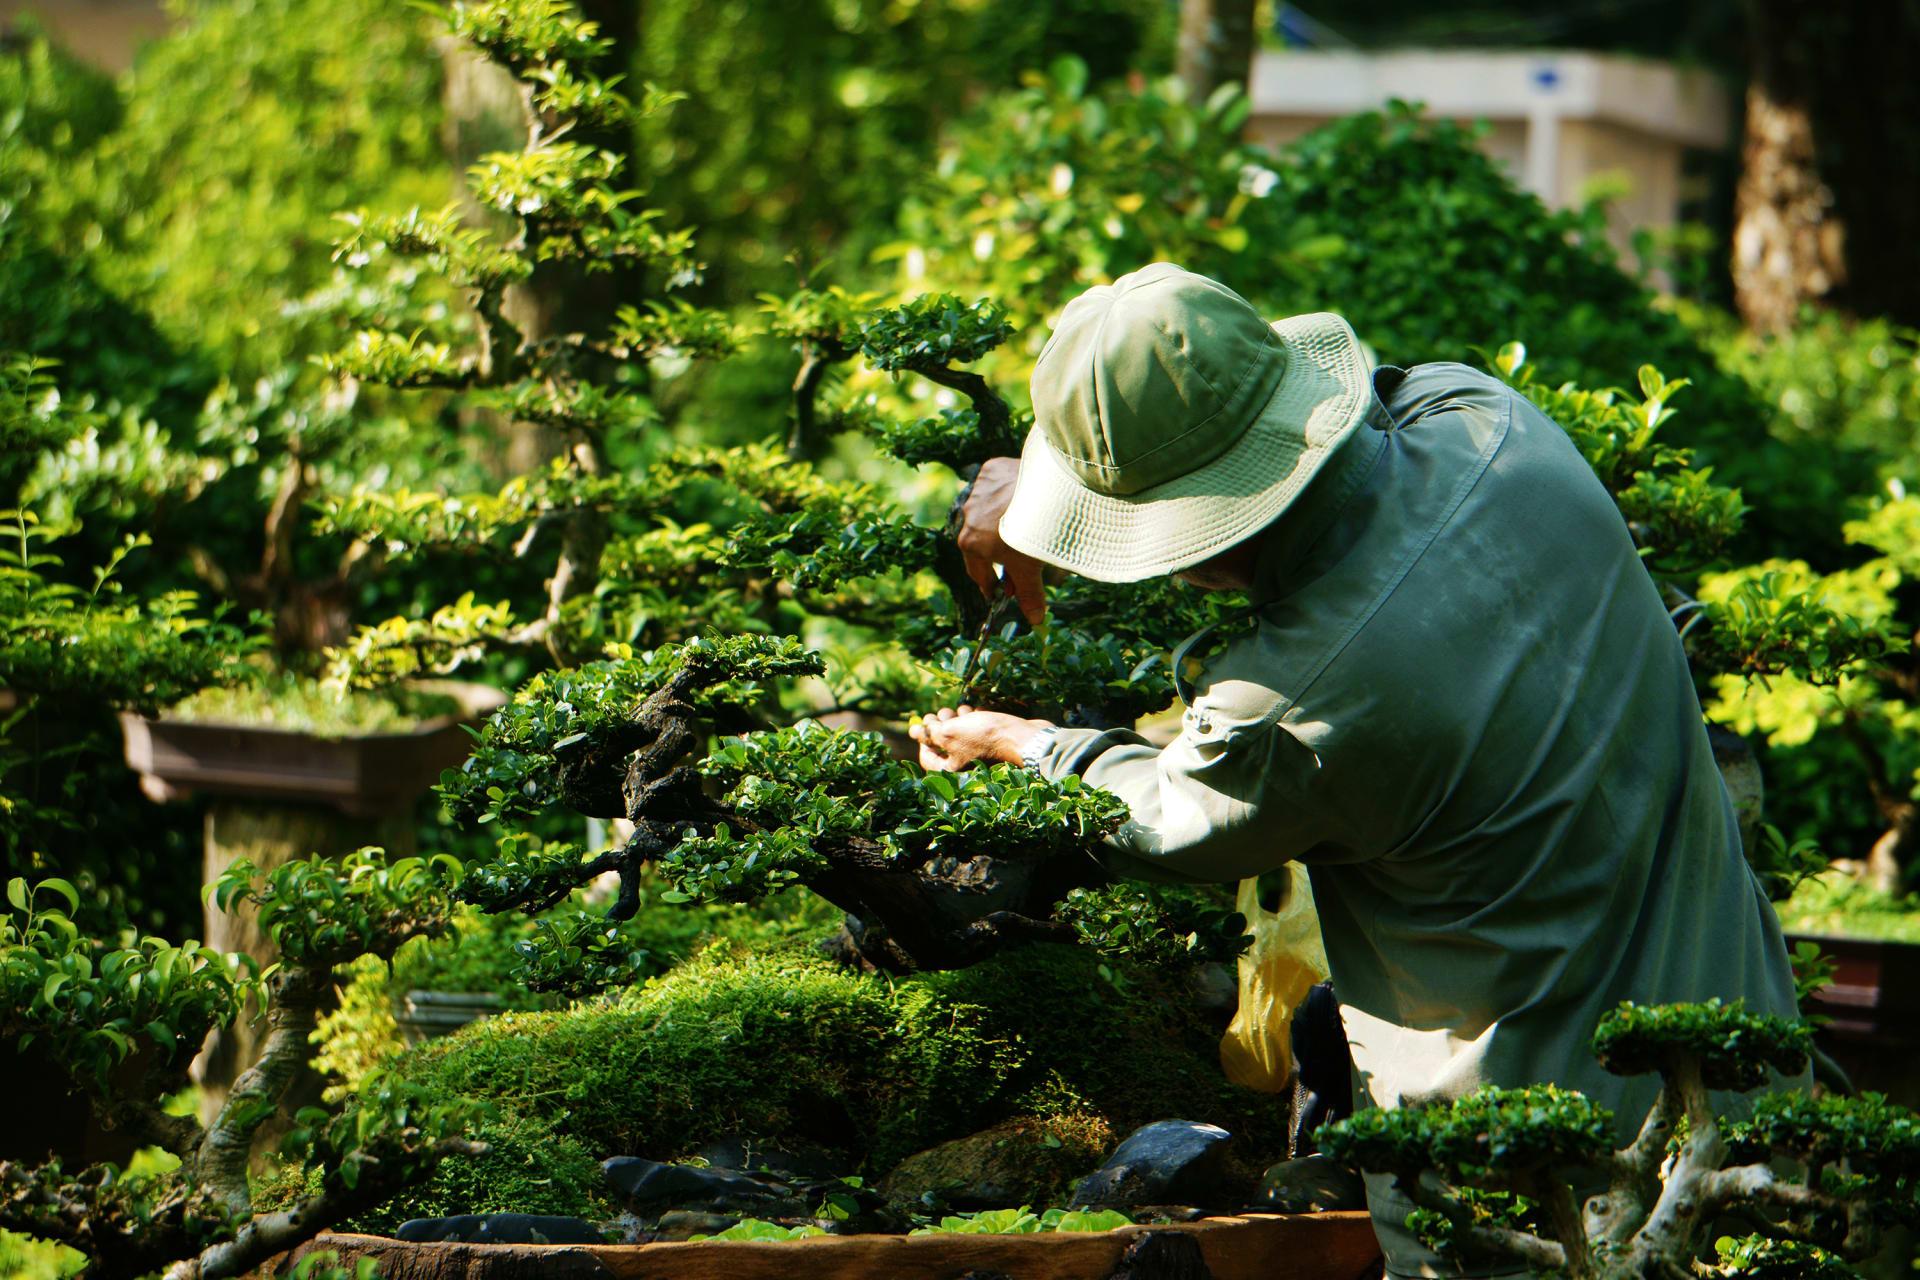 Ho Chi Minh City - Saigon Secret Gems - Day 8: Exotic Tropical Garden & The Art of Bonsai